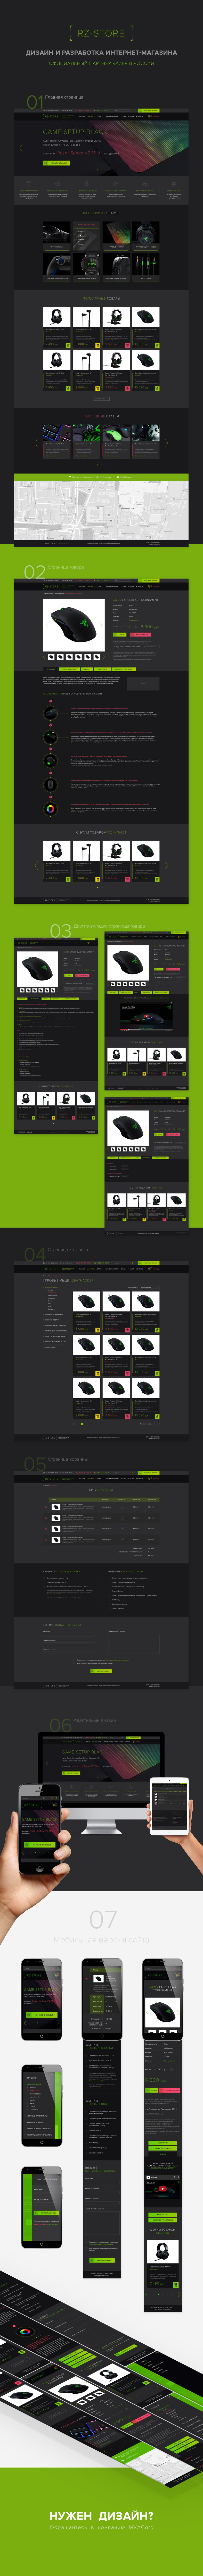 Адаптивный дизайн интернет-магазина RZ-Store